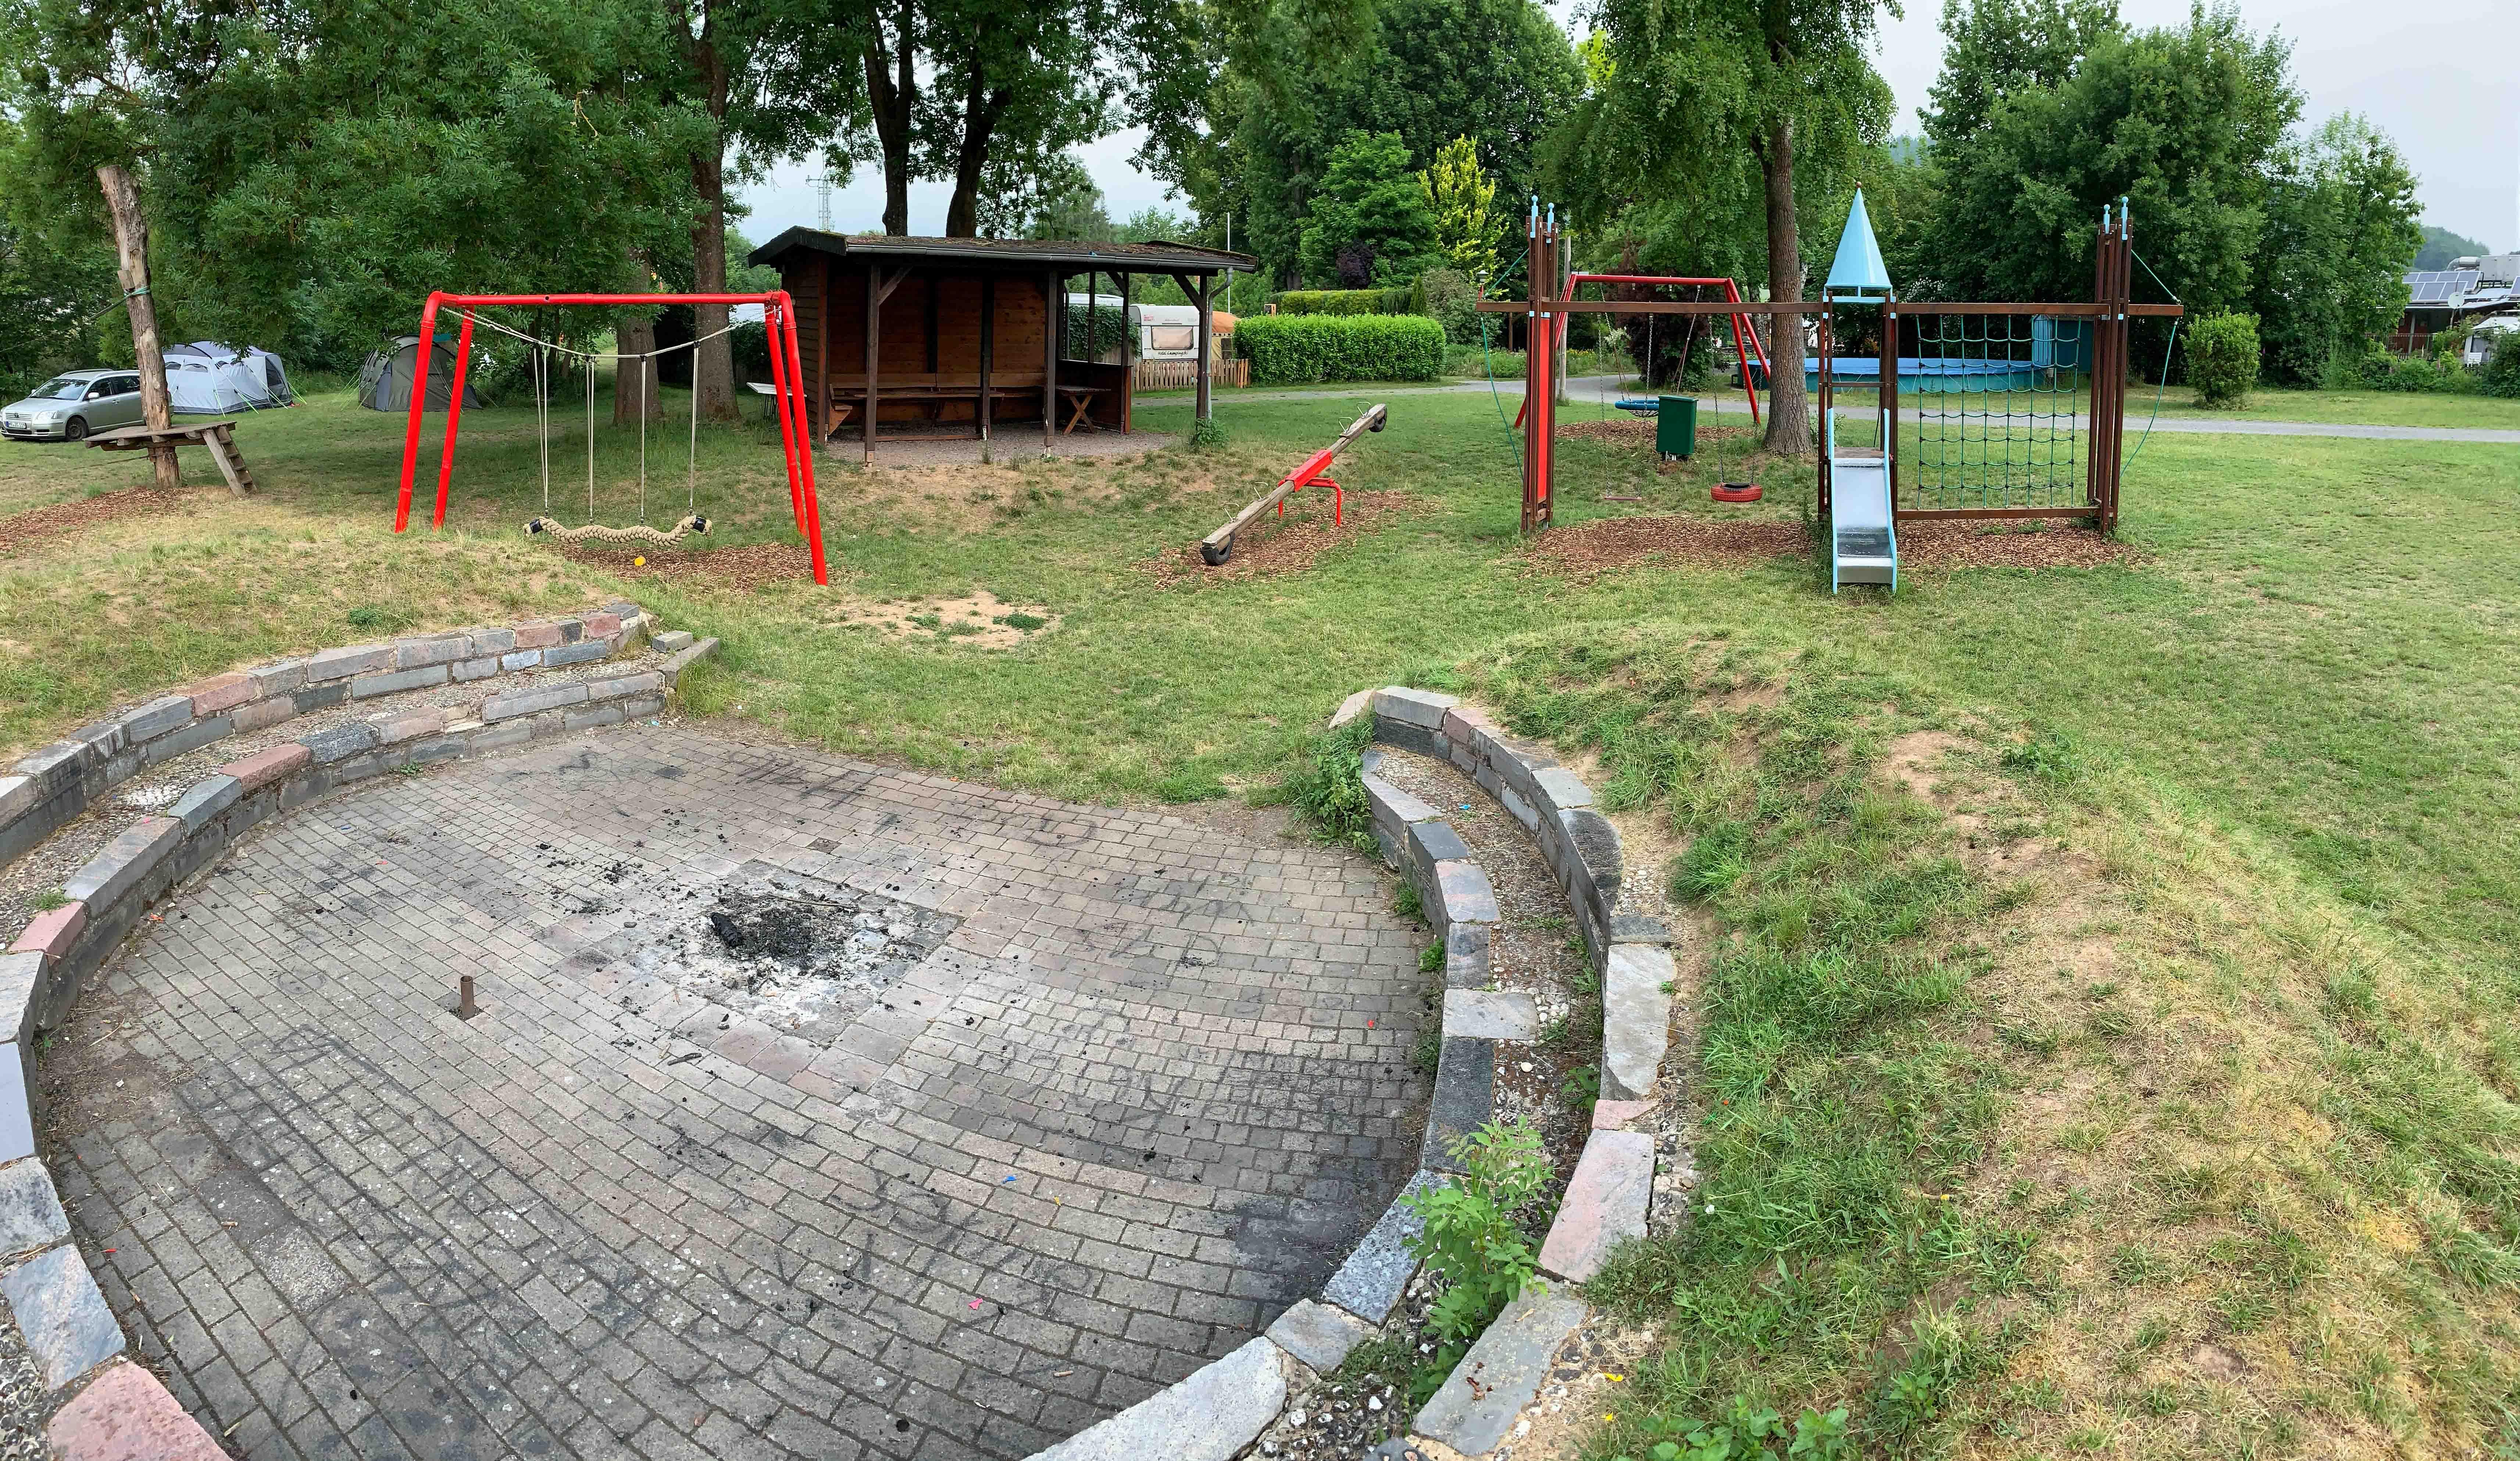 Campingplatz Auenland03